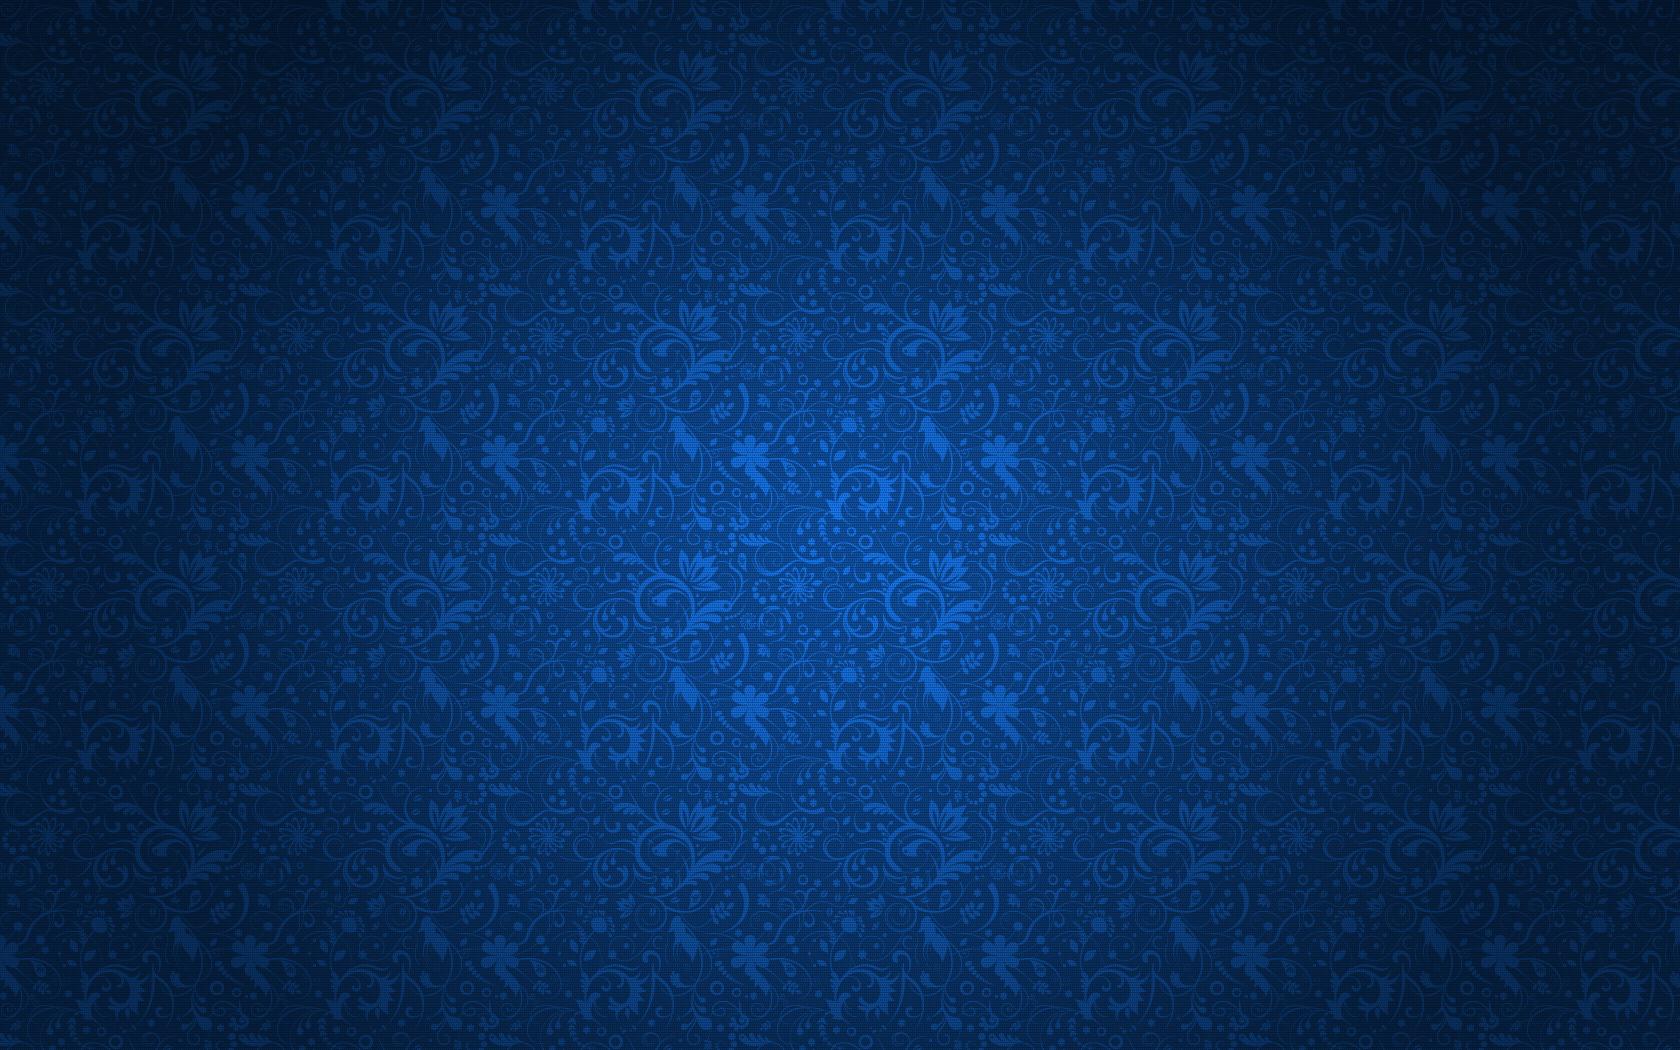 1680x1050px Navy Blue HD Wallpaper 445275 1680x1050